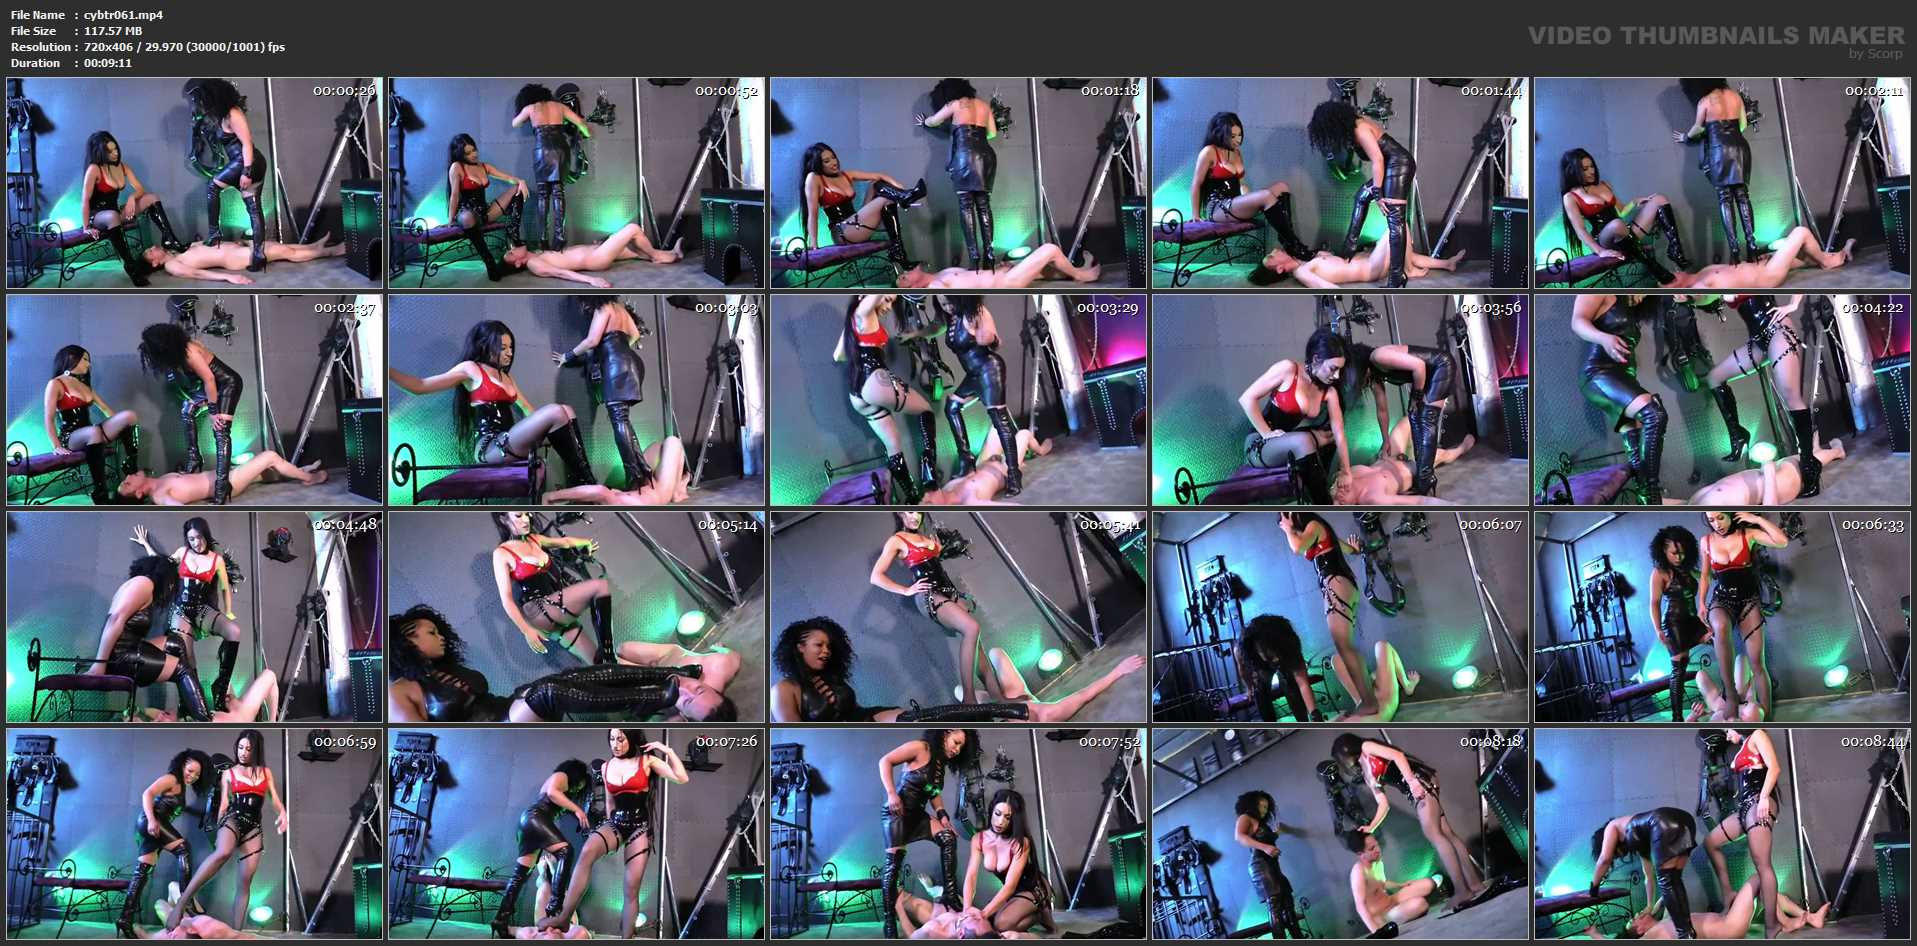 Mistress Tangent, Hera Chevalier In Scene: HUMAN CARPET - CYBILLTROY - SD/406p/MP4